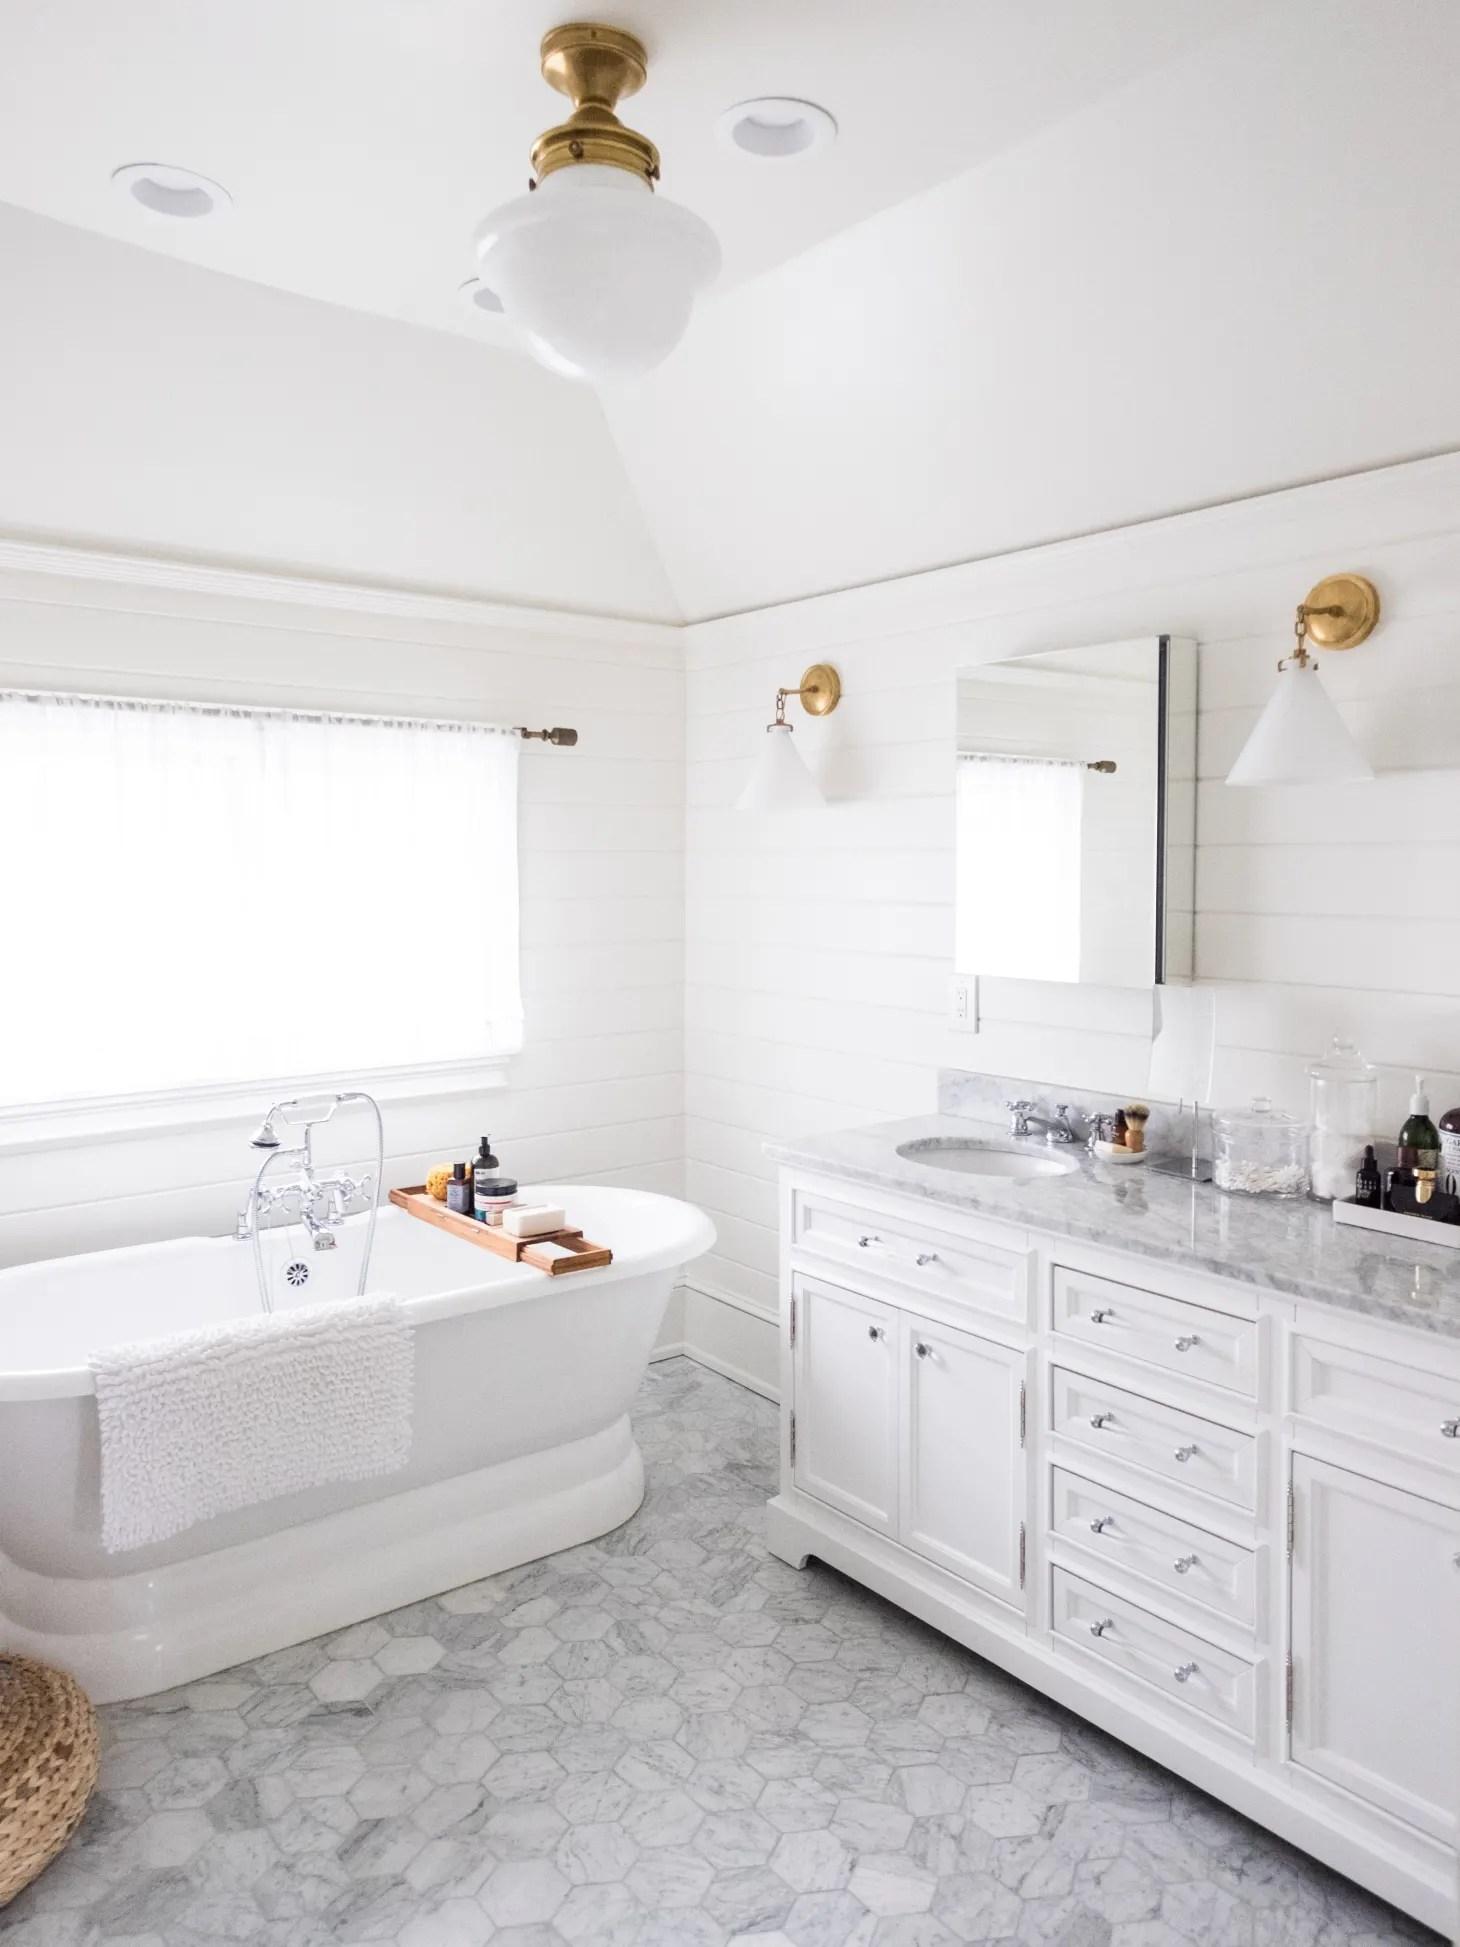 25 Small Bathroom Storage & Design Ideas - Storage ... on Small Apartment Bathroom Storage Ideas  id=15032